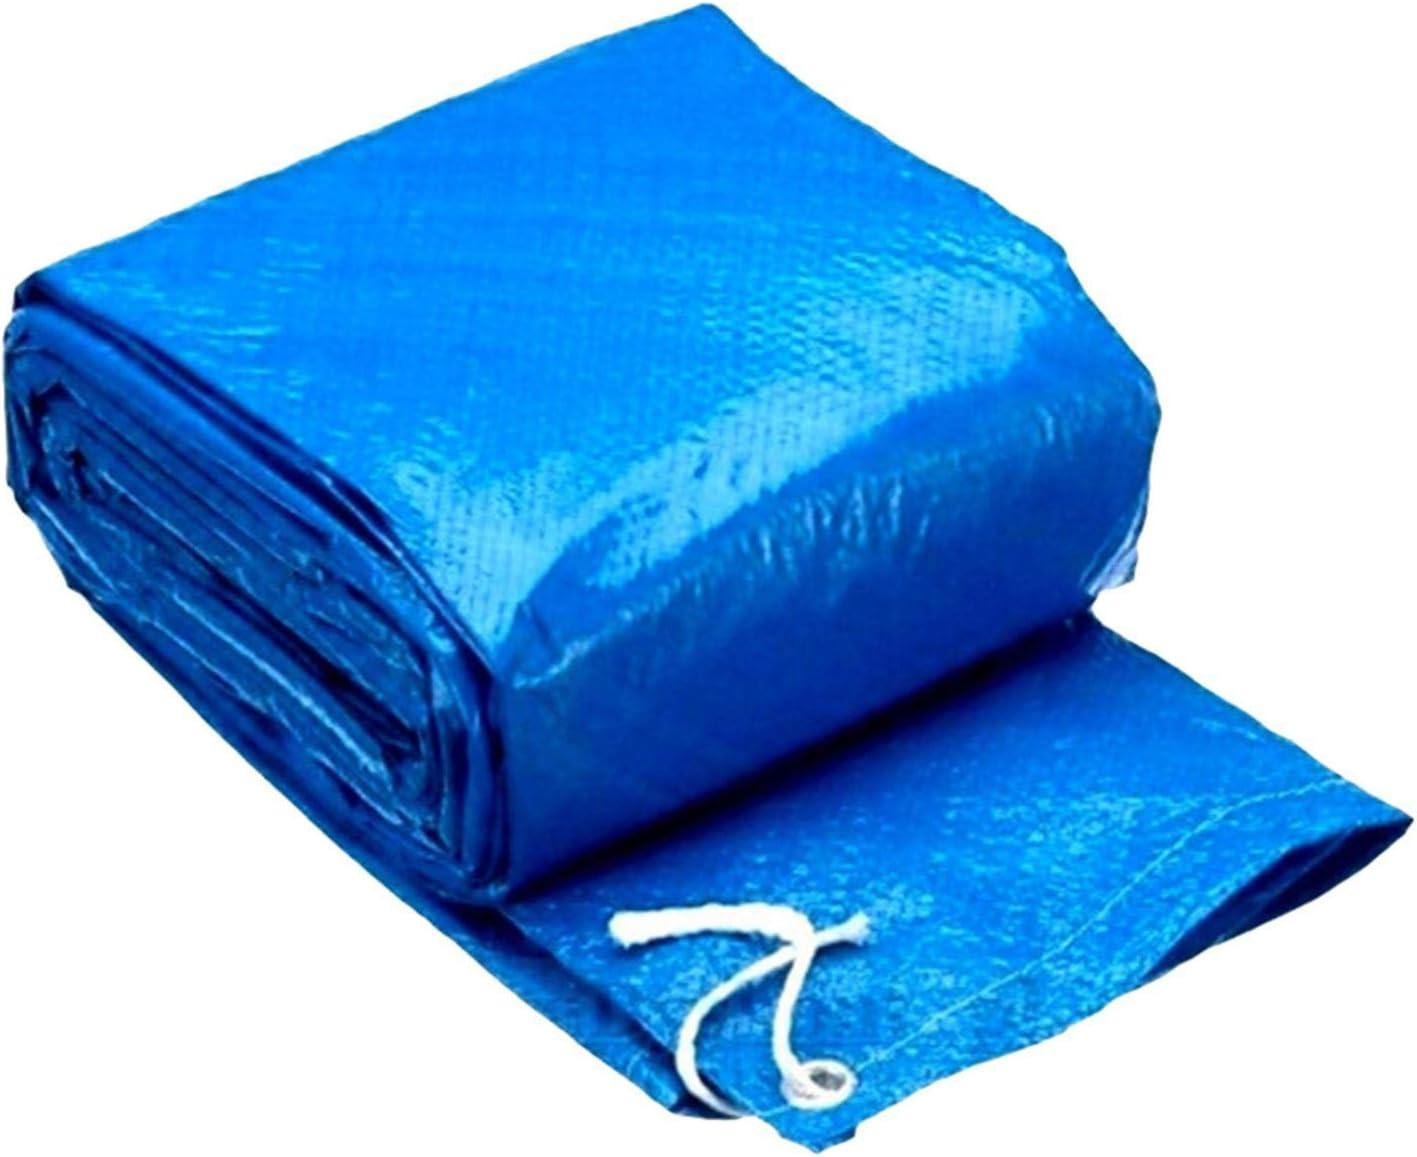 WANGQ Cobertor Piscina Hinchable, 3.95m Cubierta Solar Redonda Impermeable, Cubierta Protectora Impermeable Polvo Piscina De Aislamiento De Cine Inicio Piscina Accessor